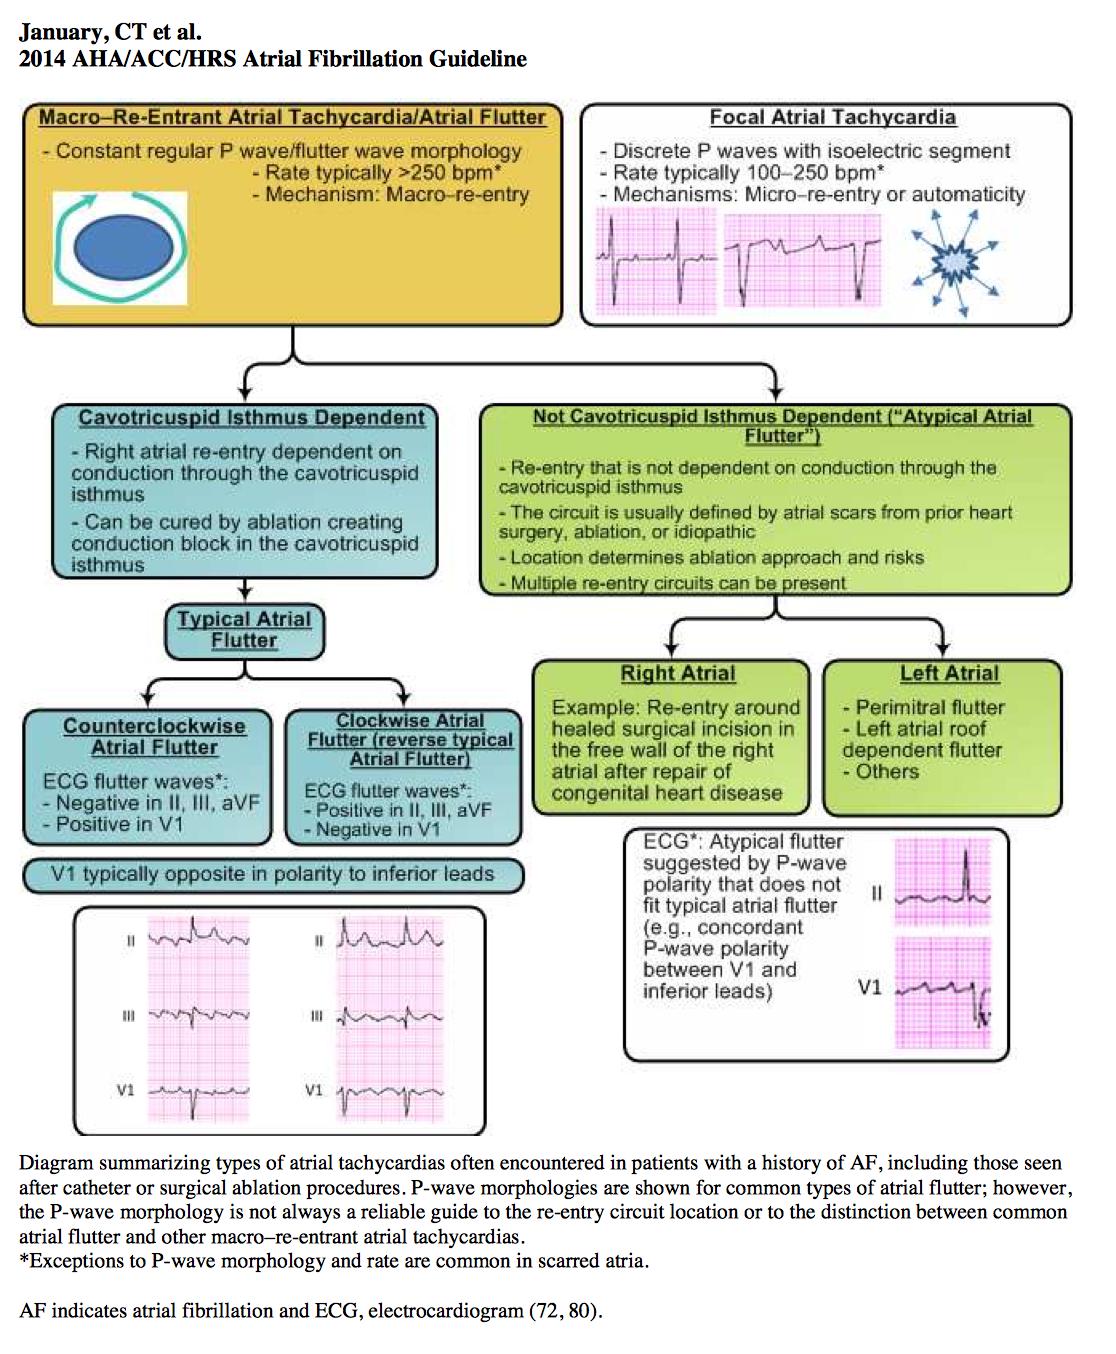 acc aha atrial fibrillation guidelines 2016